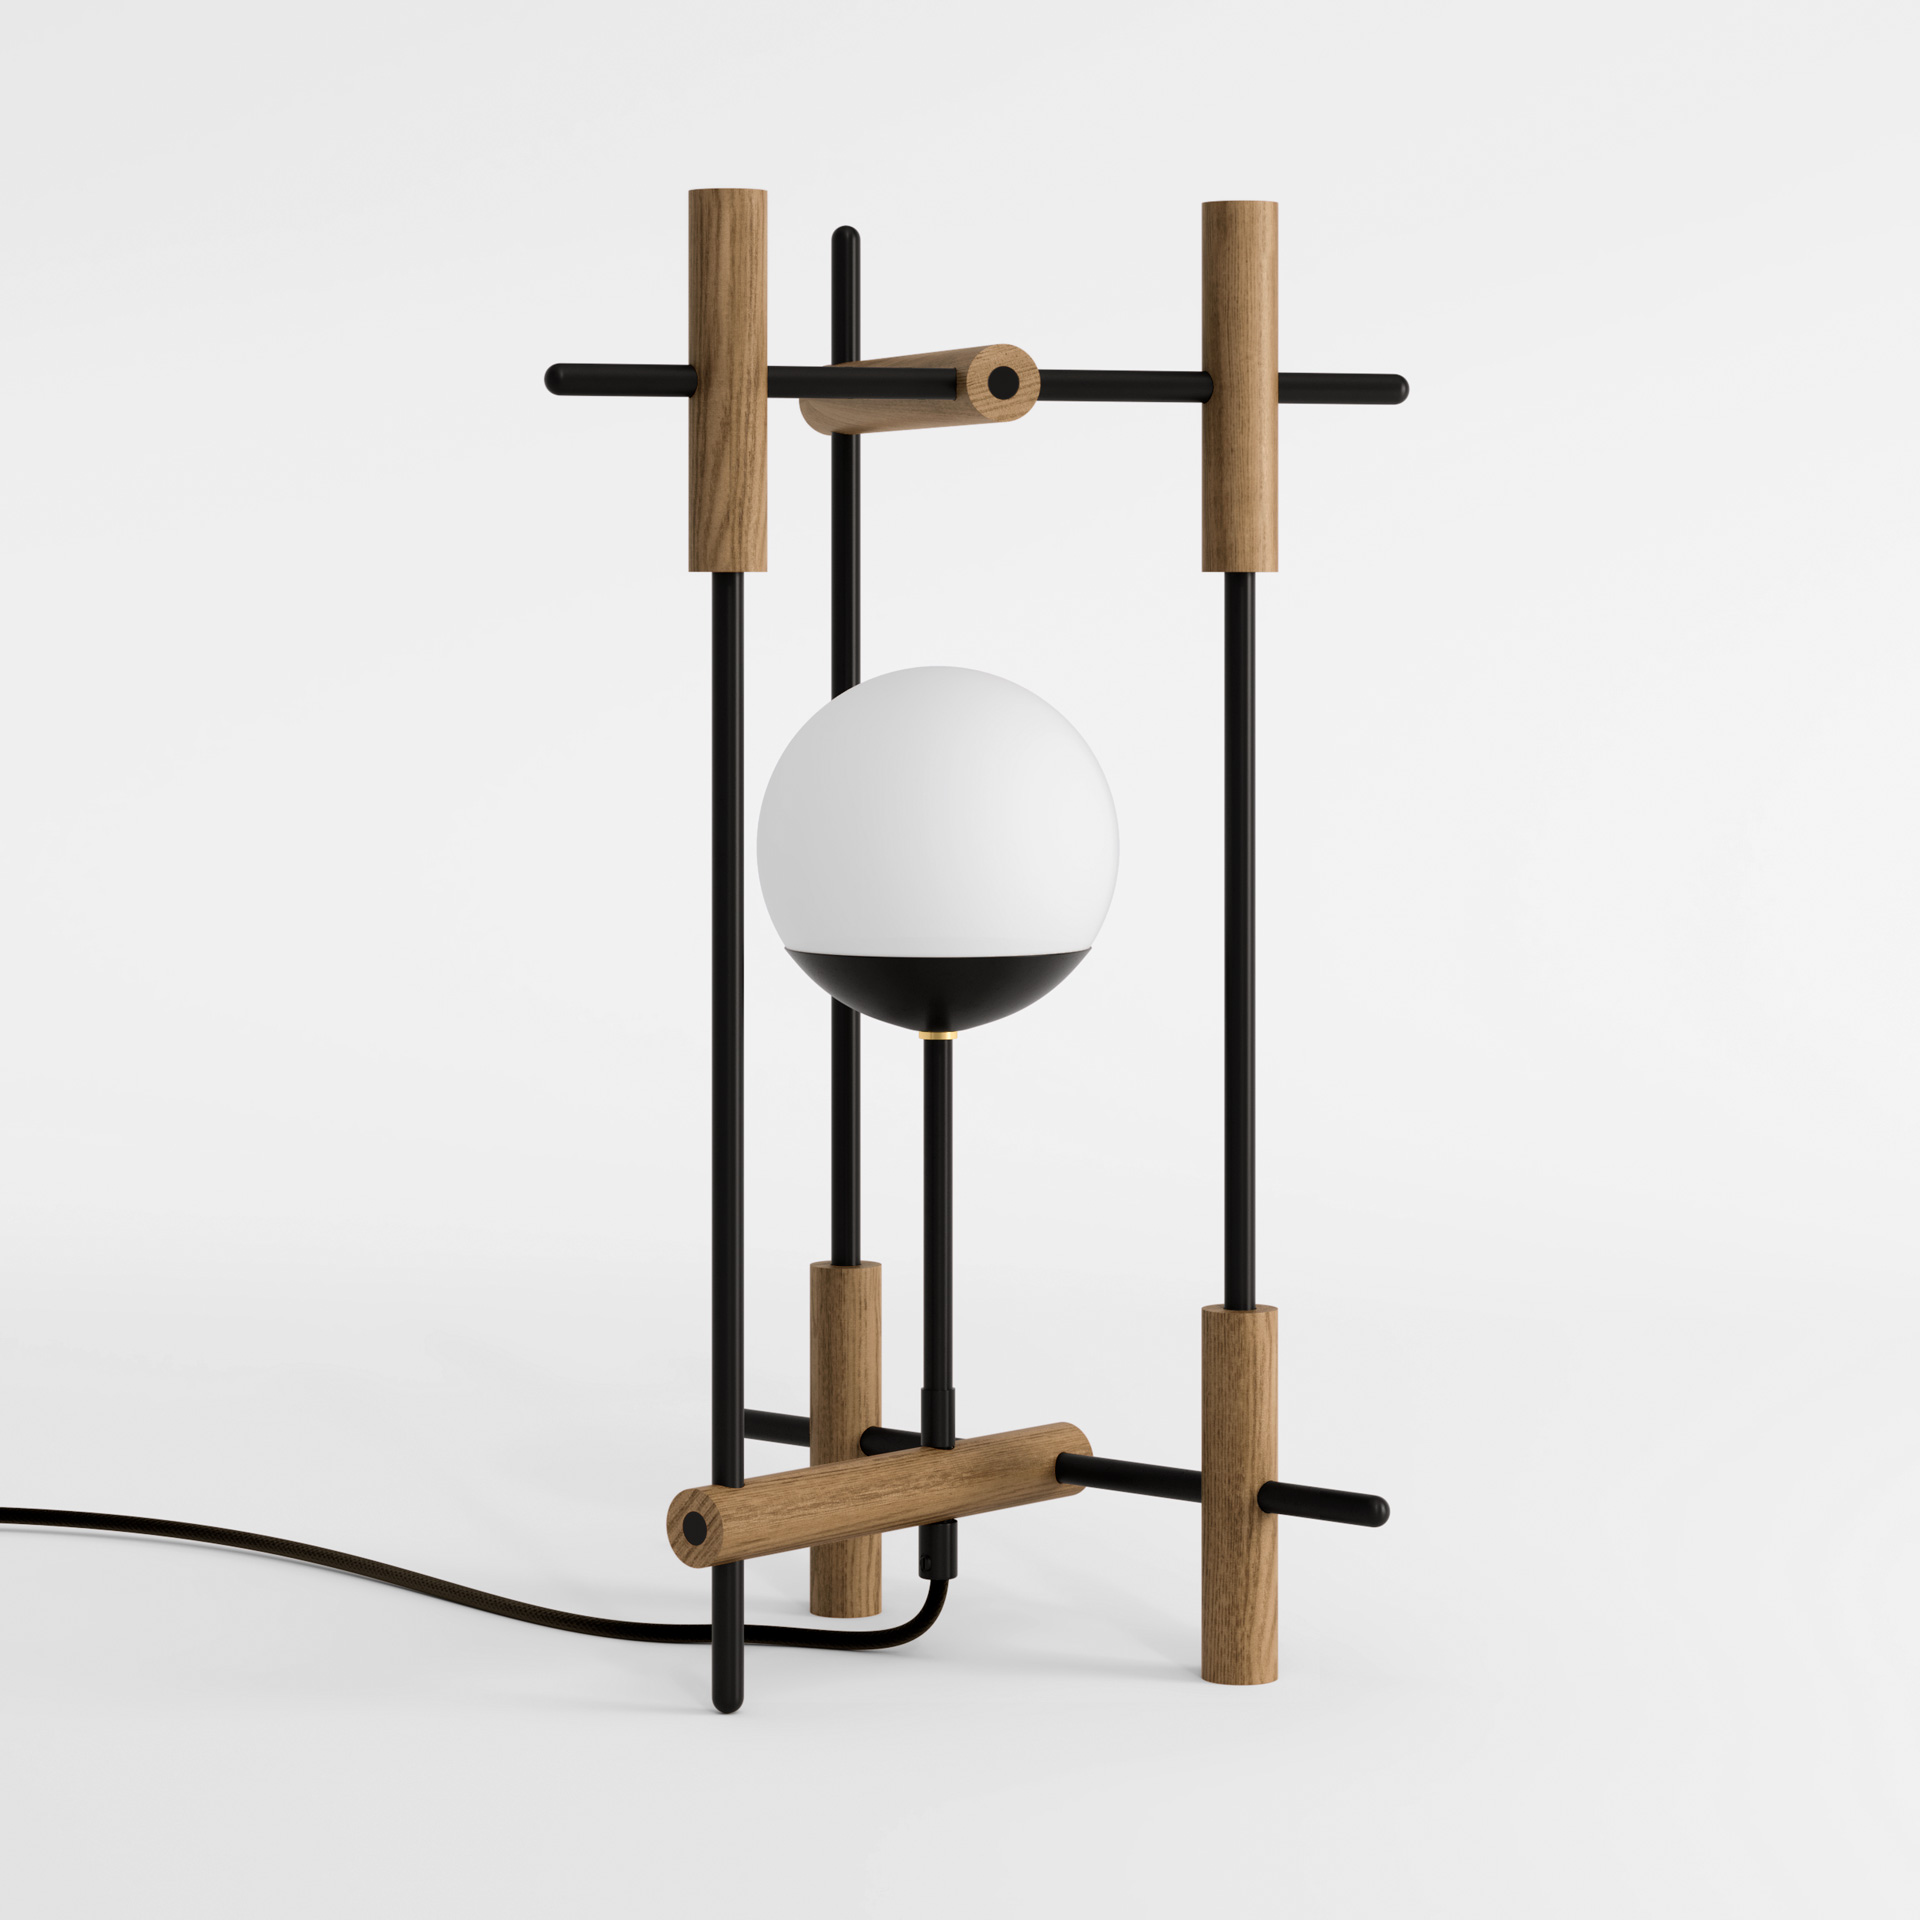 Tanjun Collection by Tomasz Kudelski & Kaito Yamada for Moon Moth